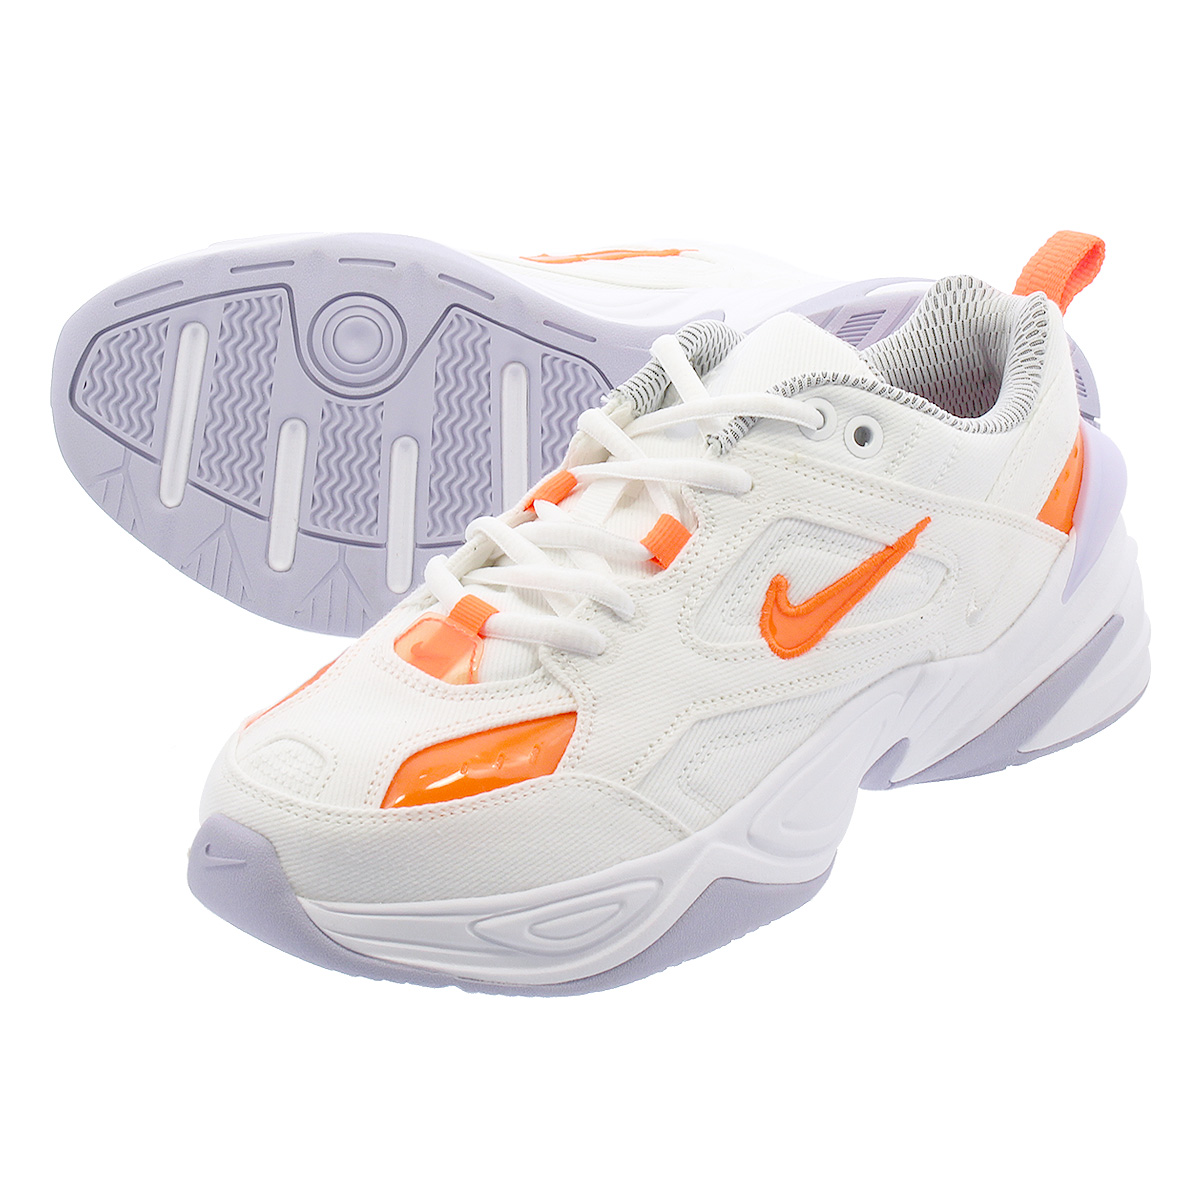 NIKE WMNS M2K TEKNO Nike women M2K techno WHITE/ORANGE bv0970-100